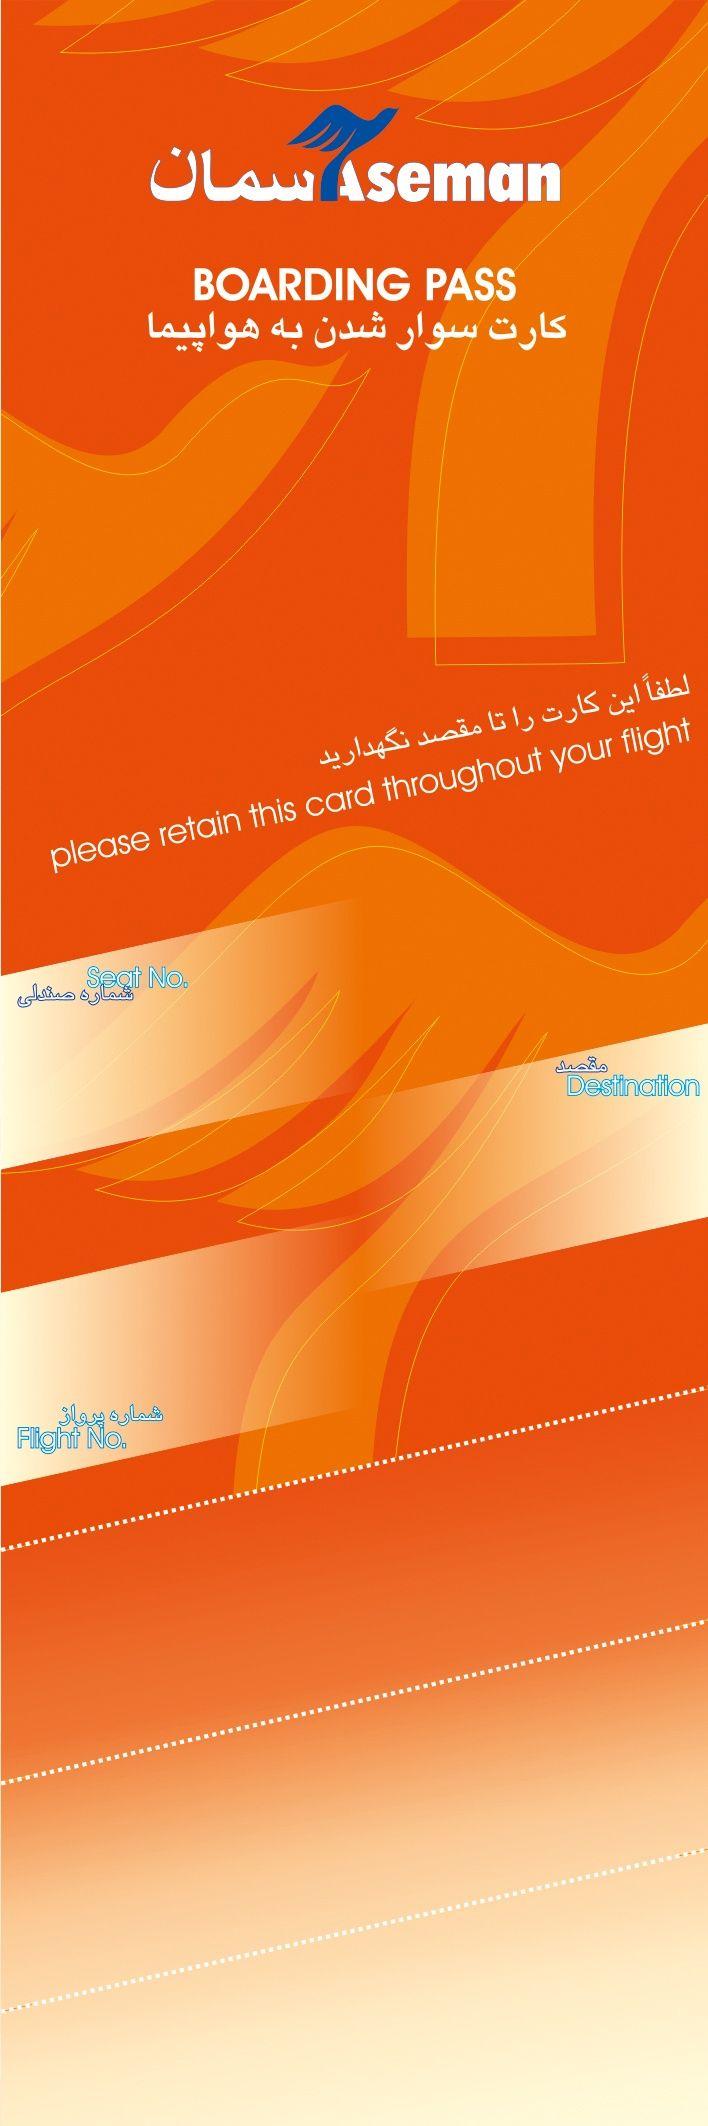 Design for Boarding Pass